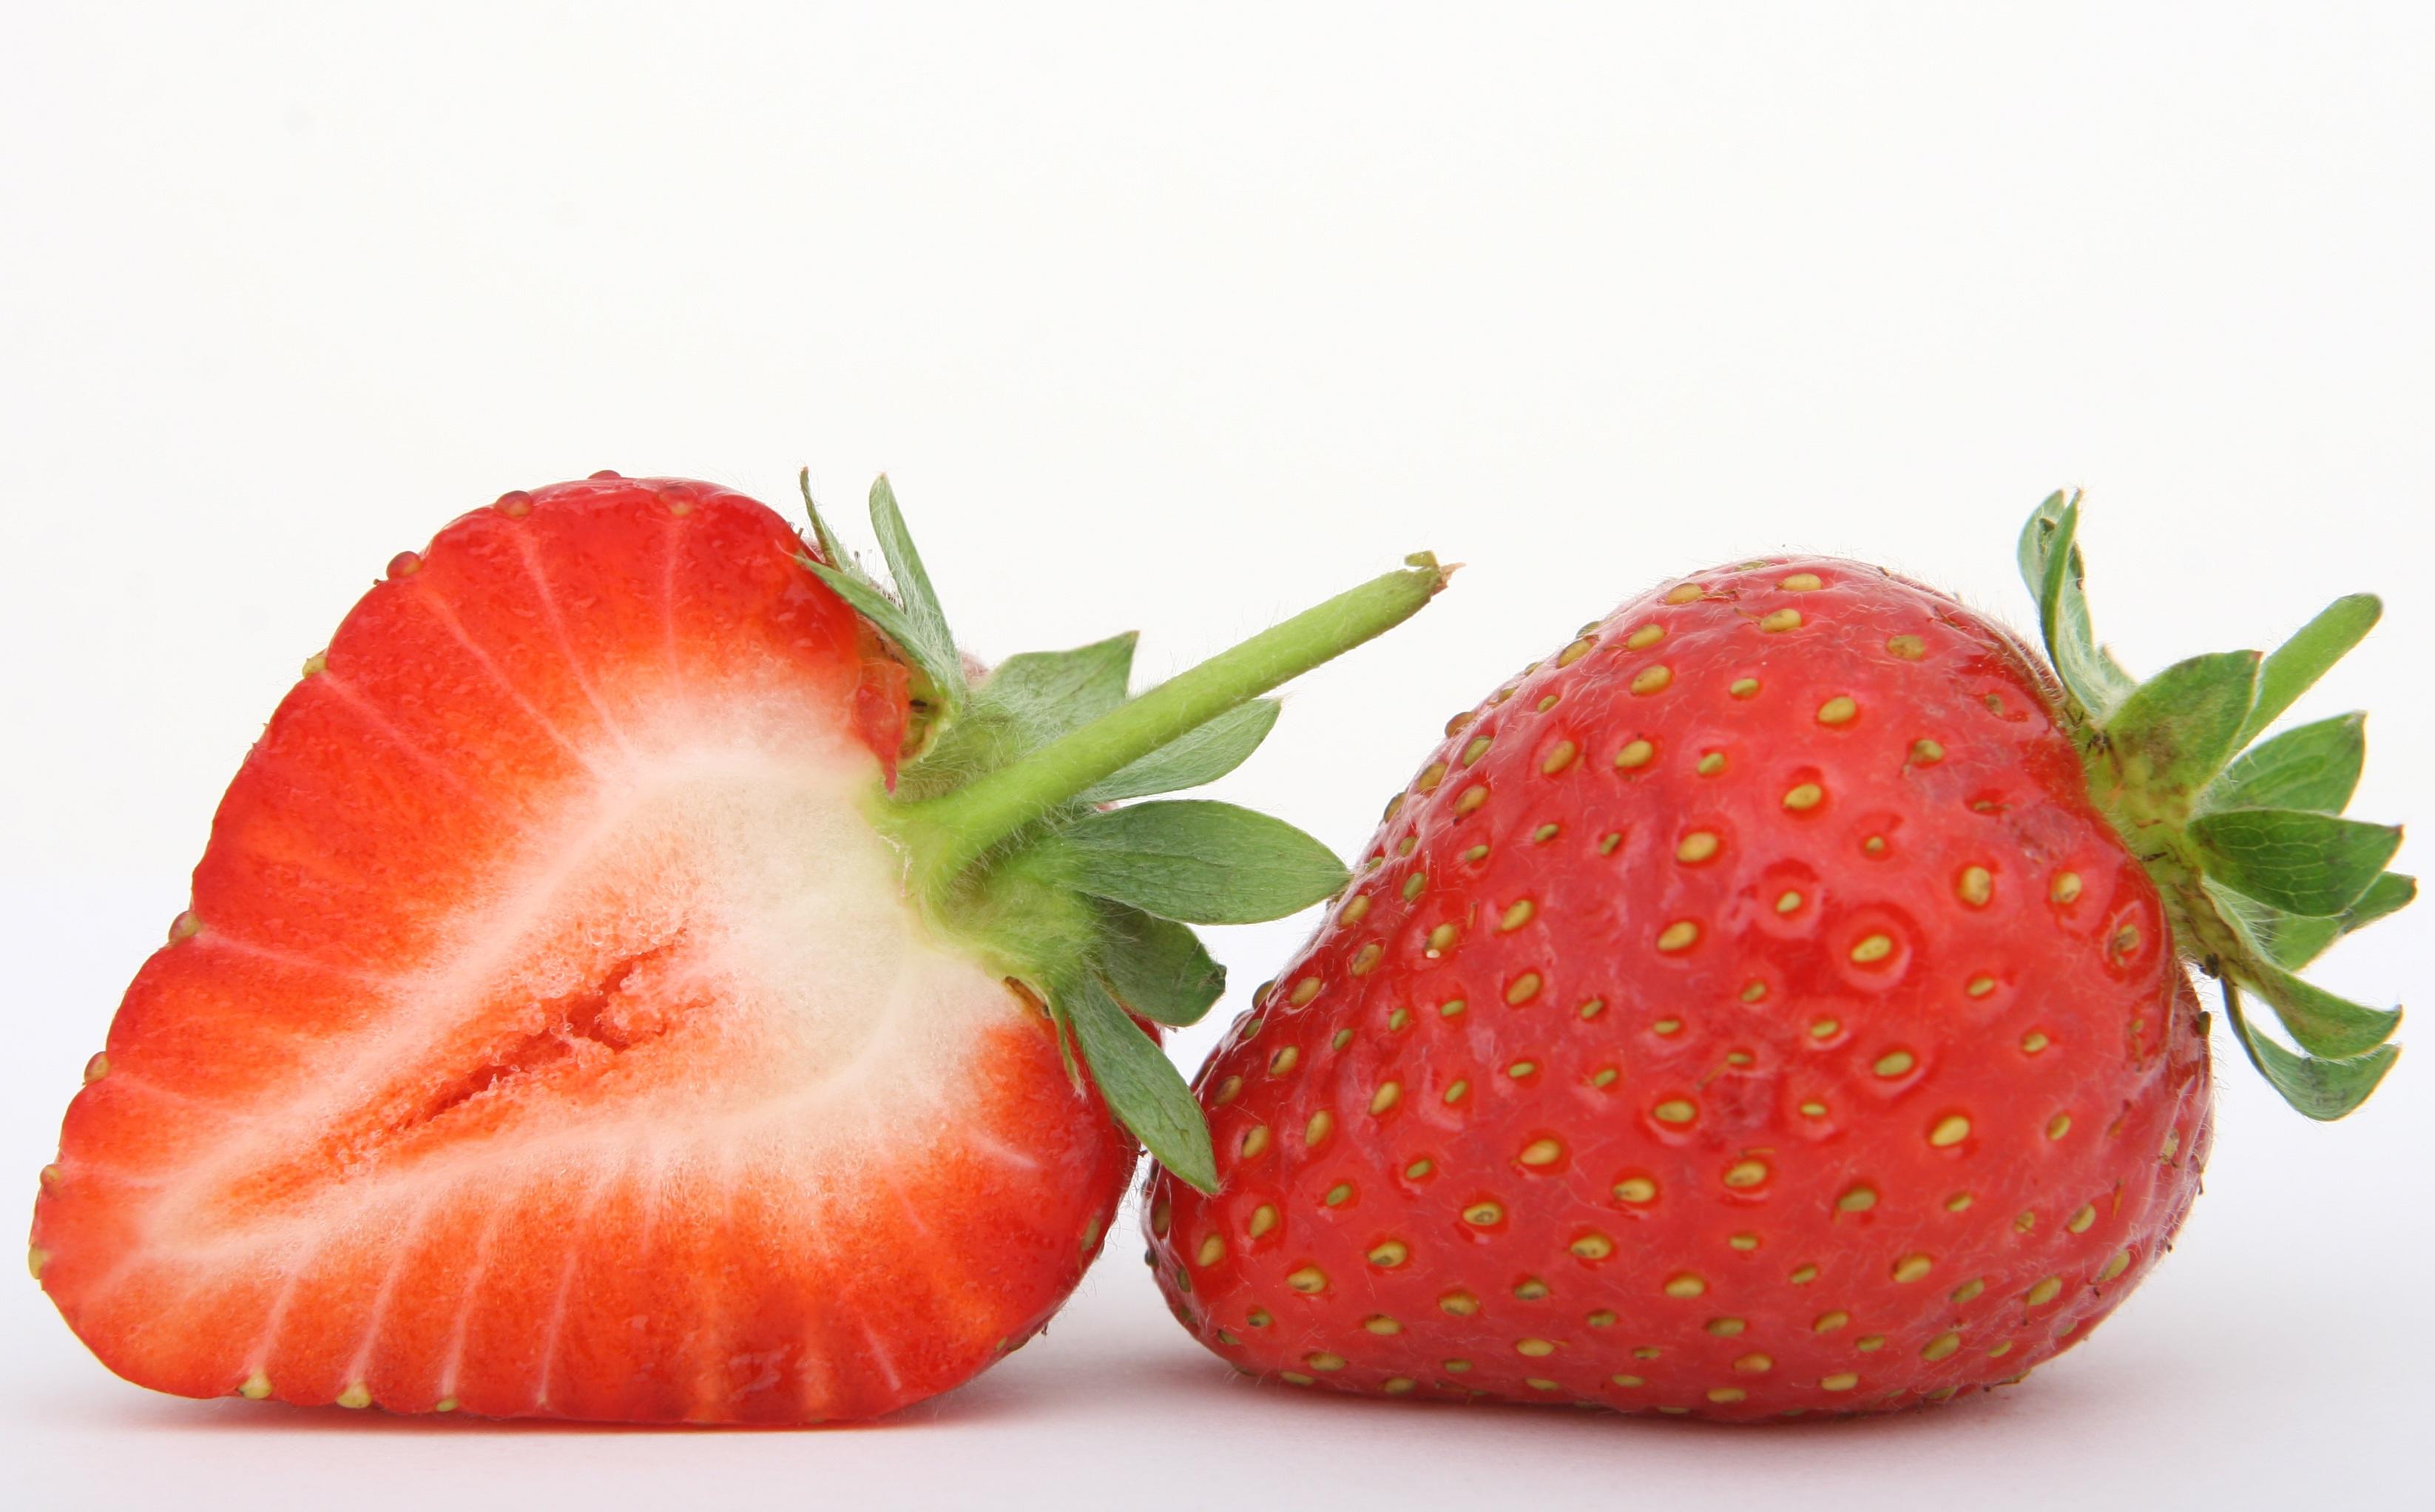 Free Images : White, Fruit, Berry, Sweet, Summer, Ripe